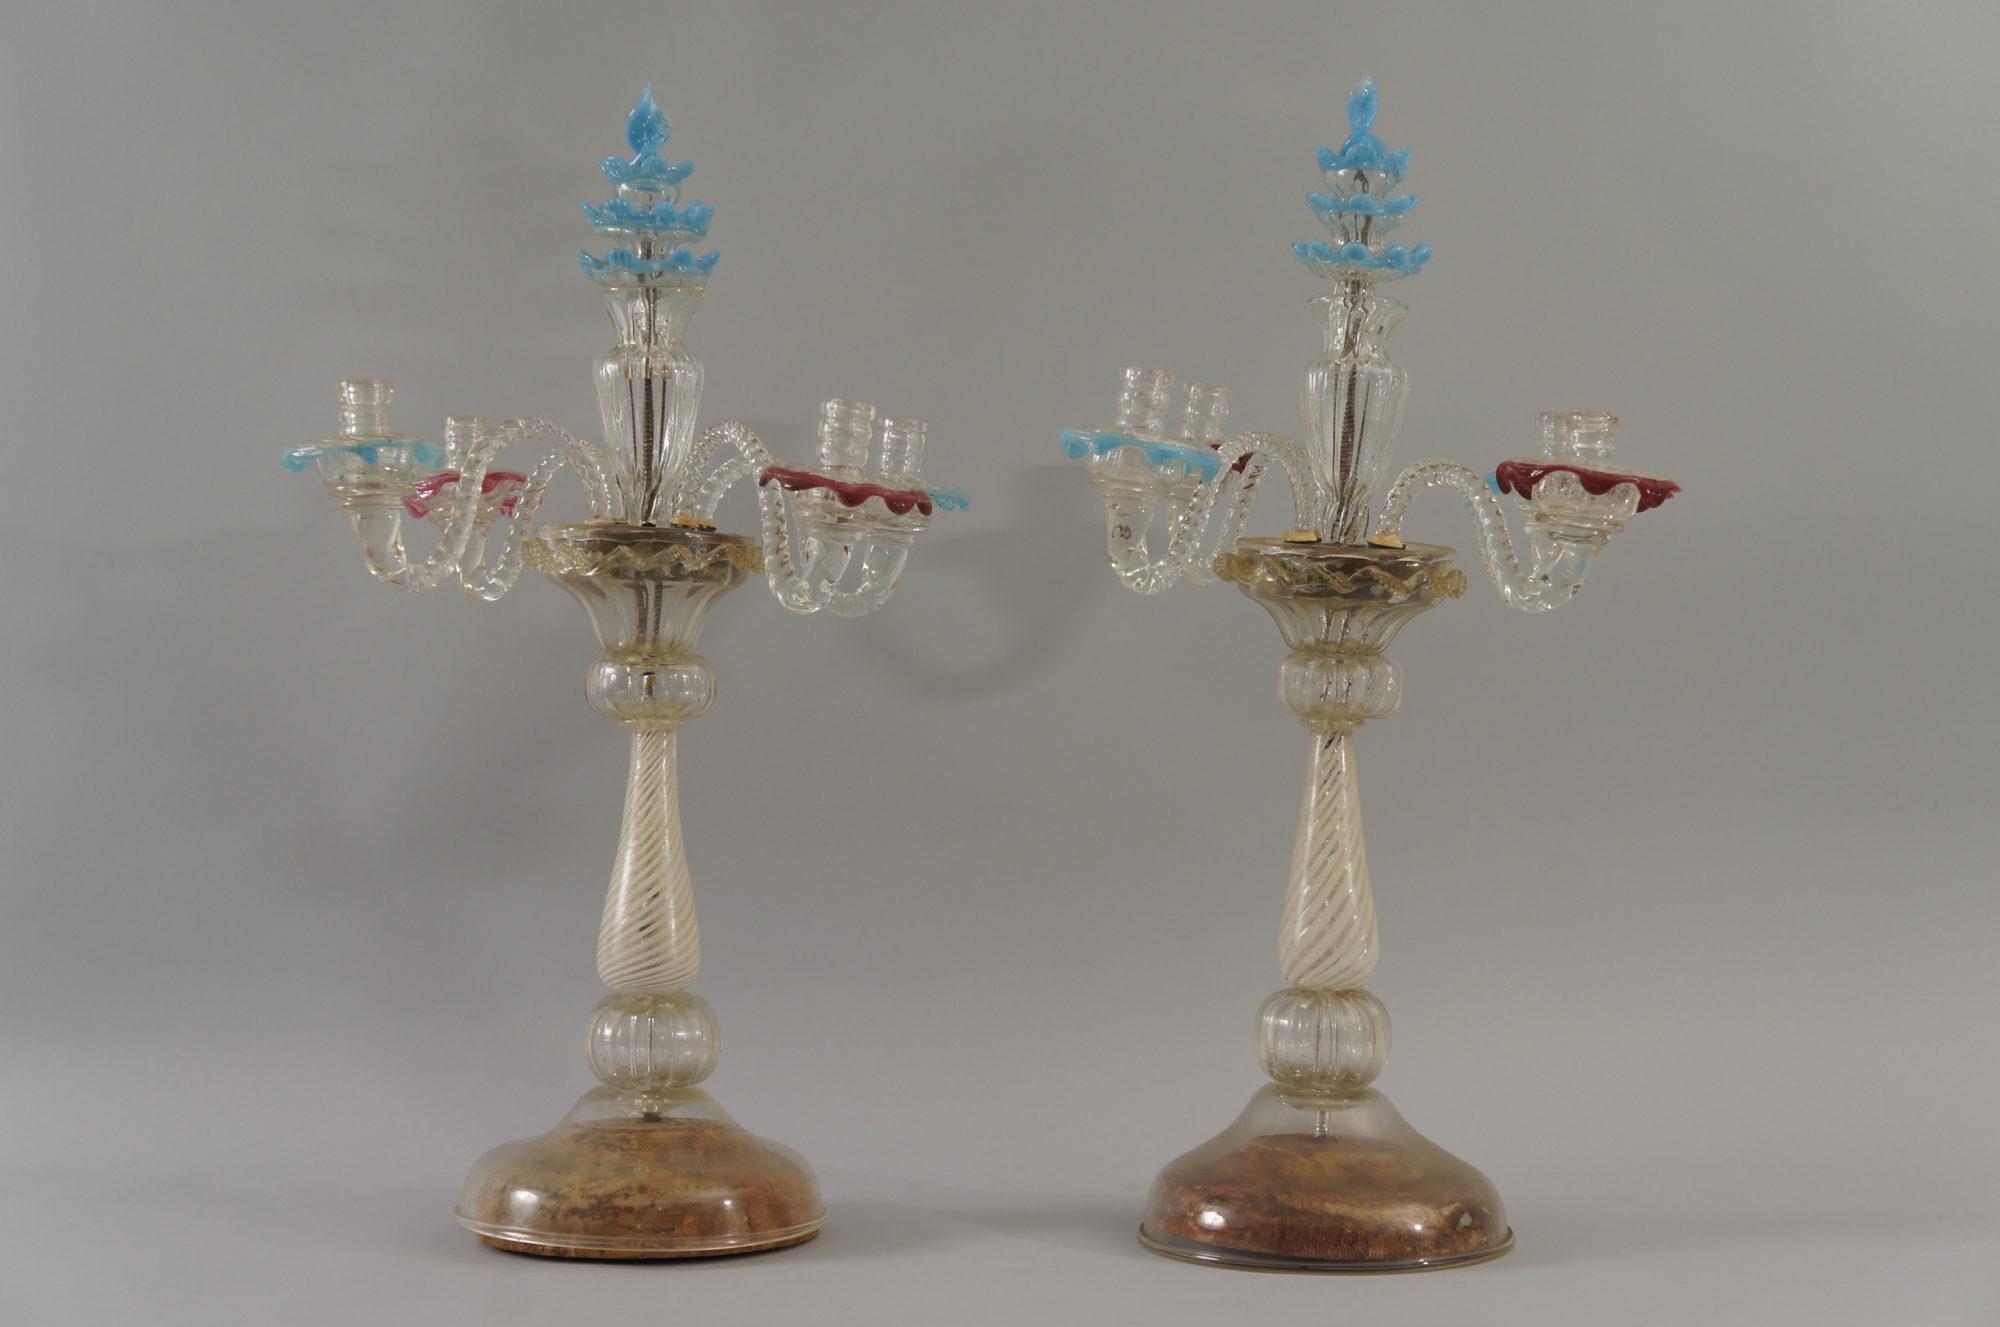 Pair of Italian Venetian Glass Candelabra